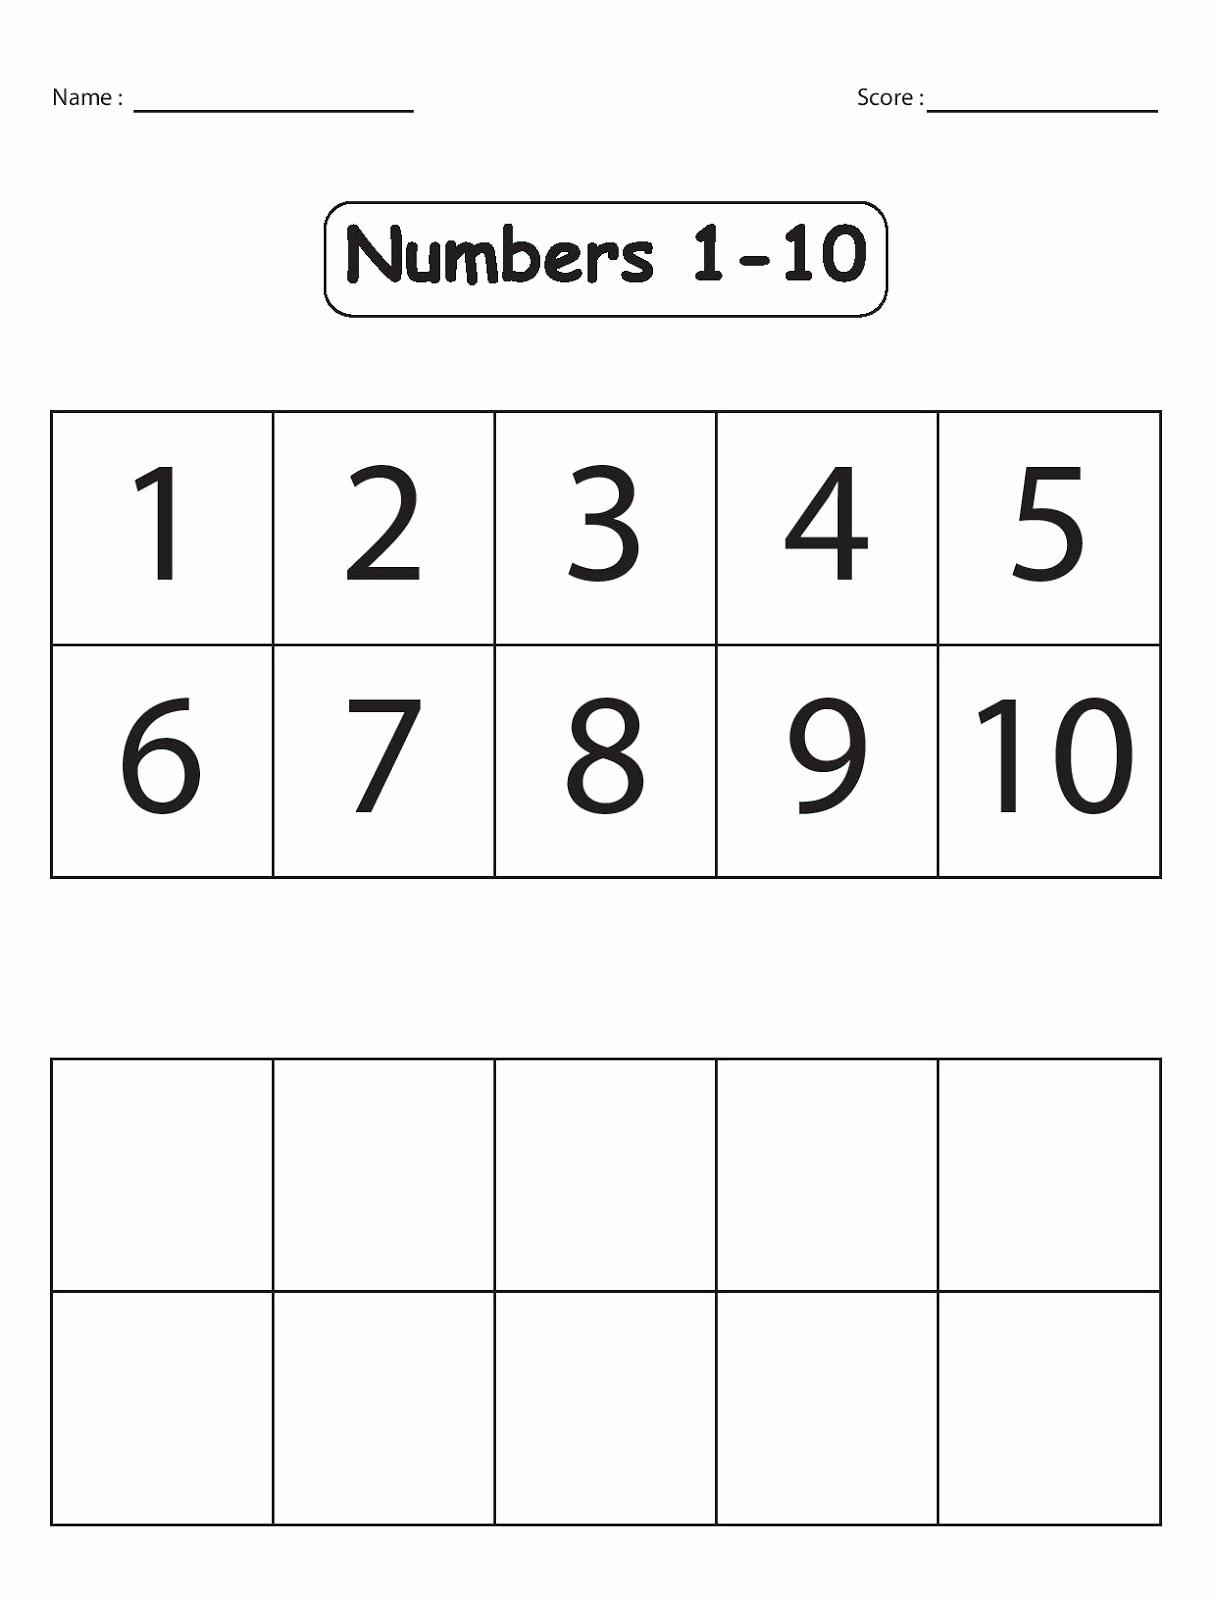 Missing Number Worksheets 1 10 Best Of Missing Numbers Worksheets 1 10